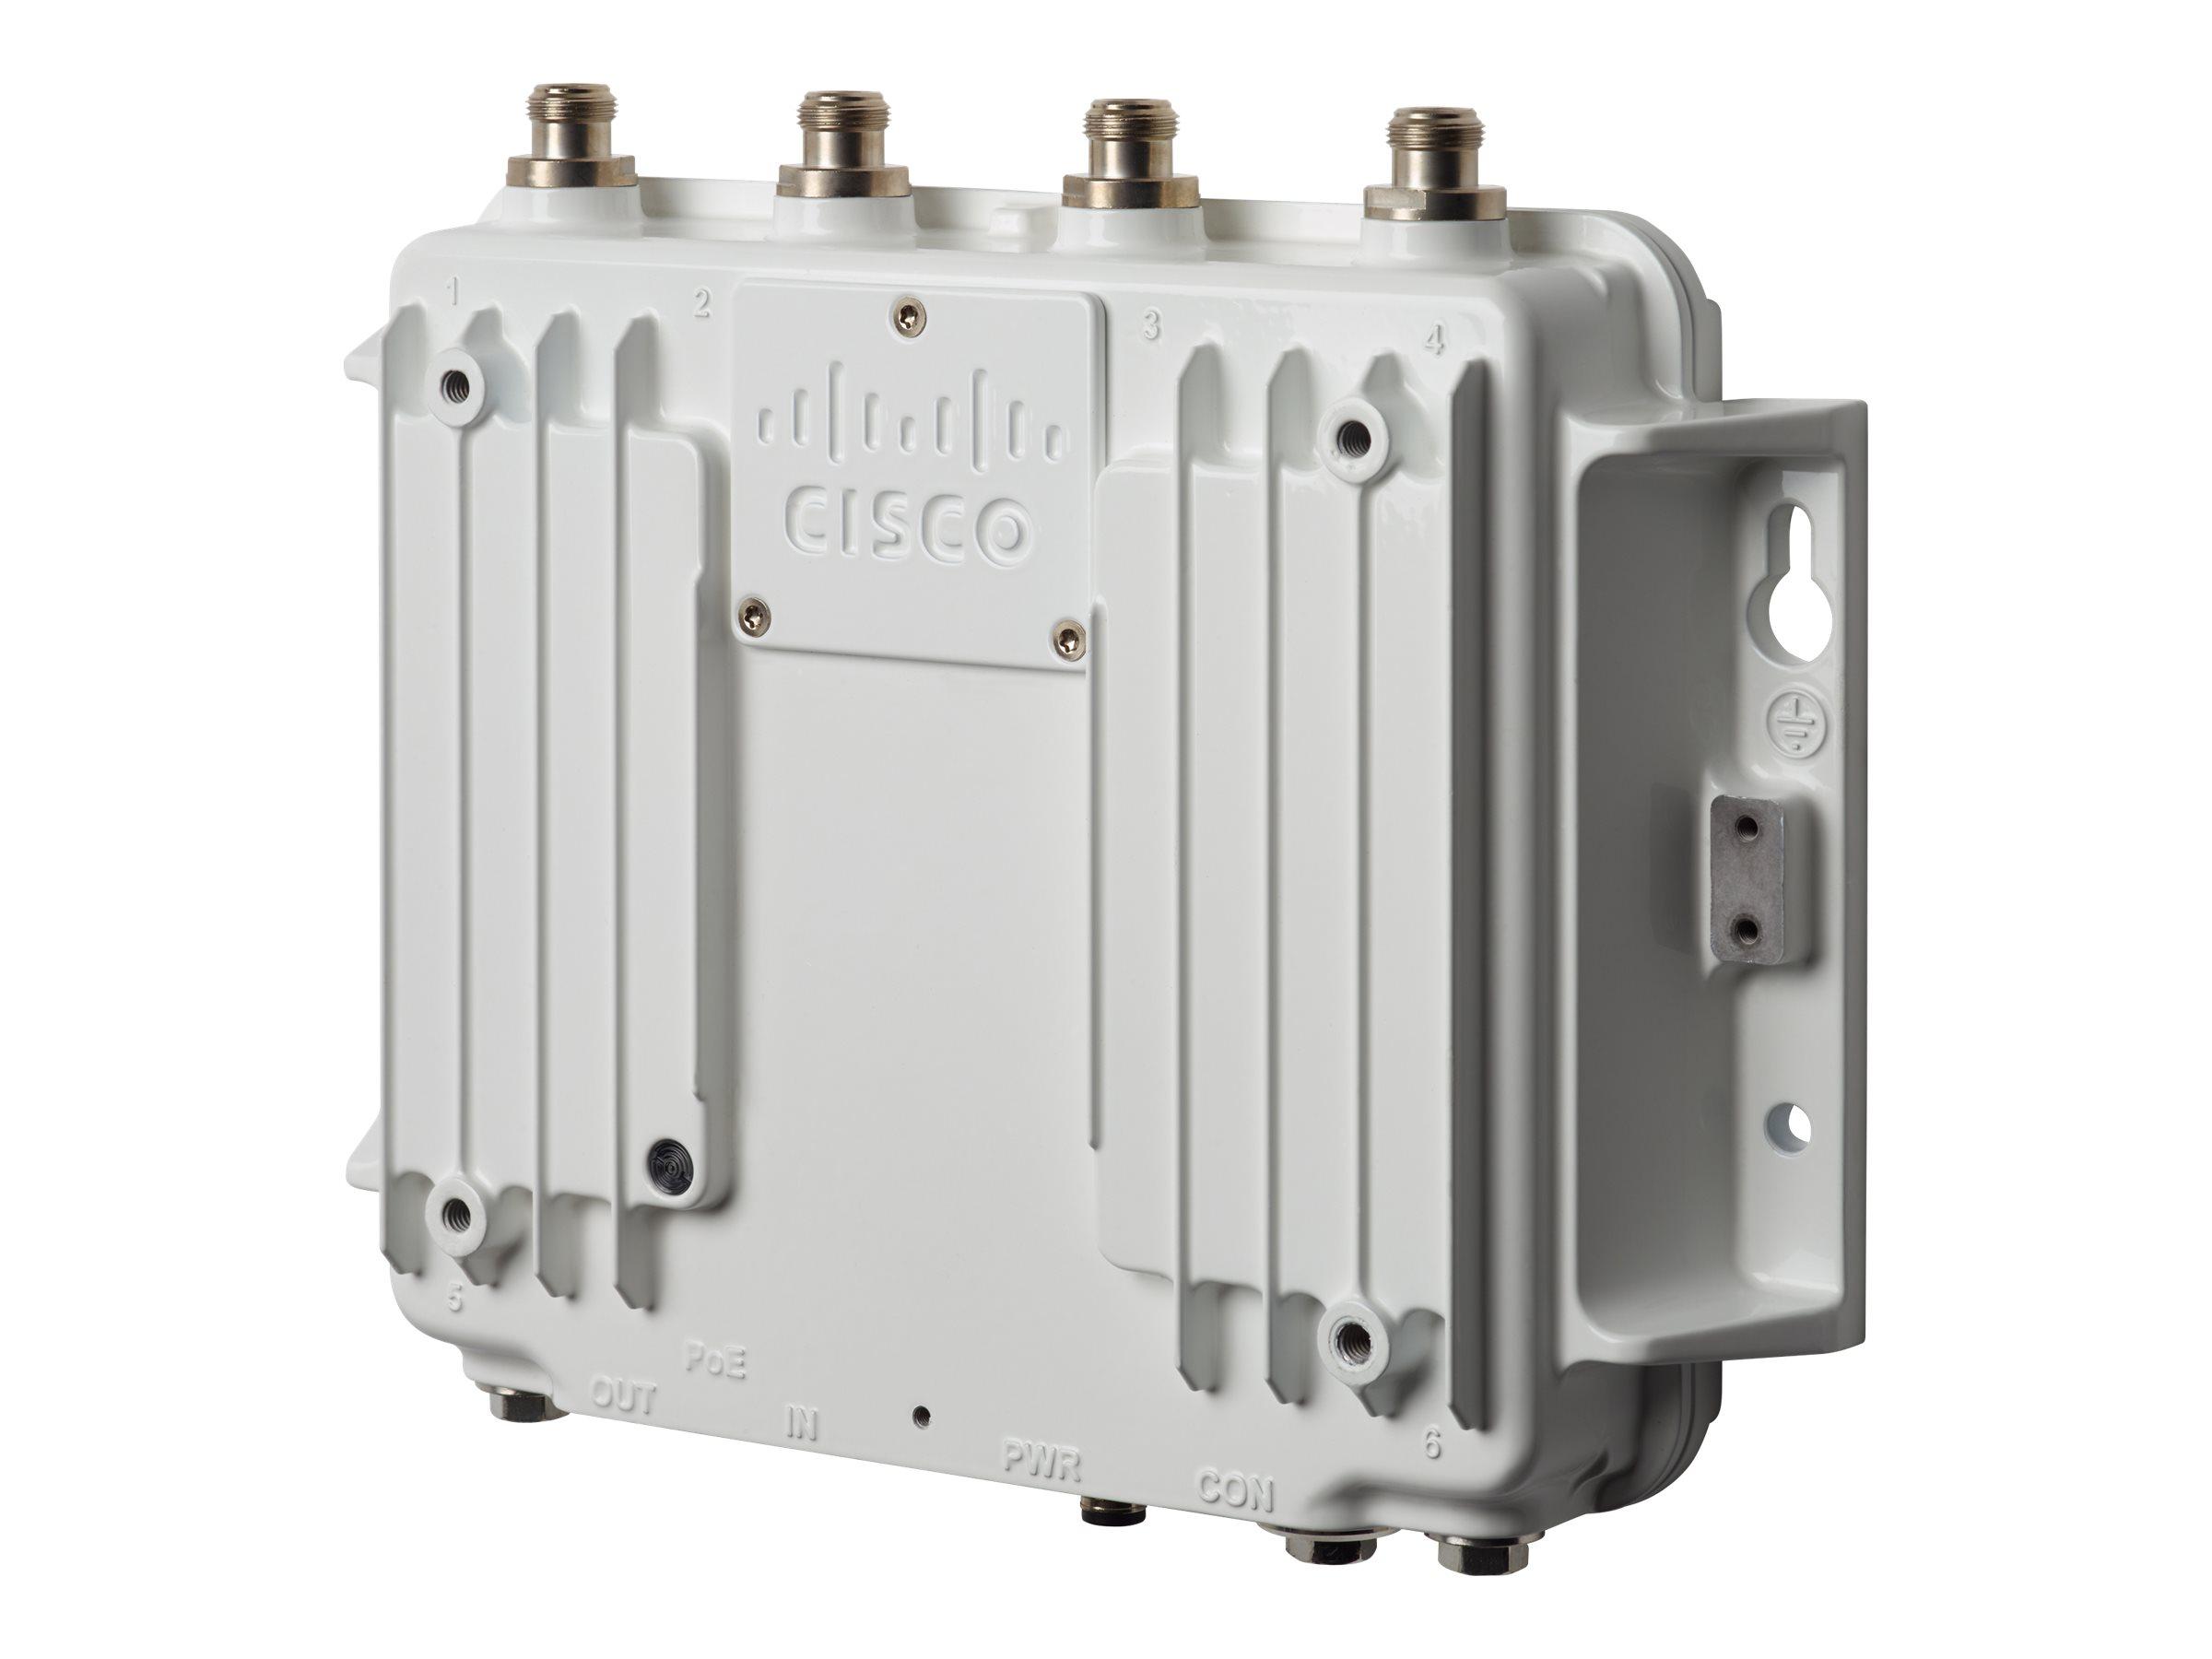 Cisco Industrial Wireless 3700 Series - Funkbasisstation - 802.11ac (draft 5.0) - Wi-Fi - Dualband